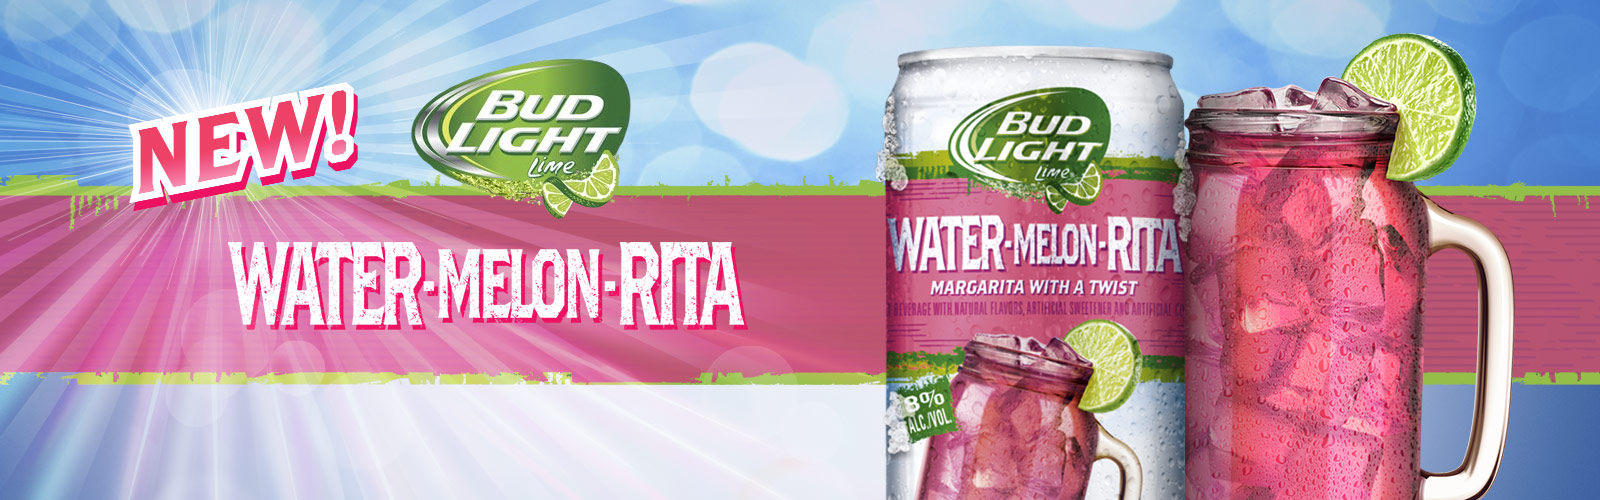 Great Water Melon Rita